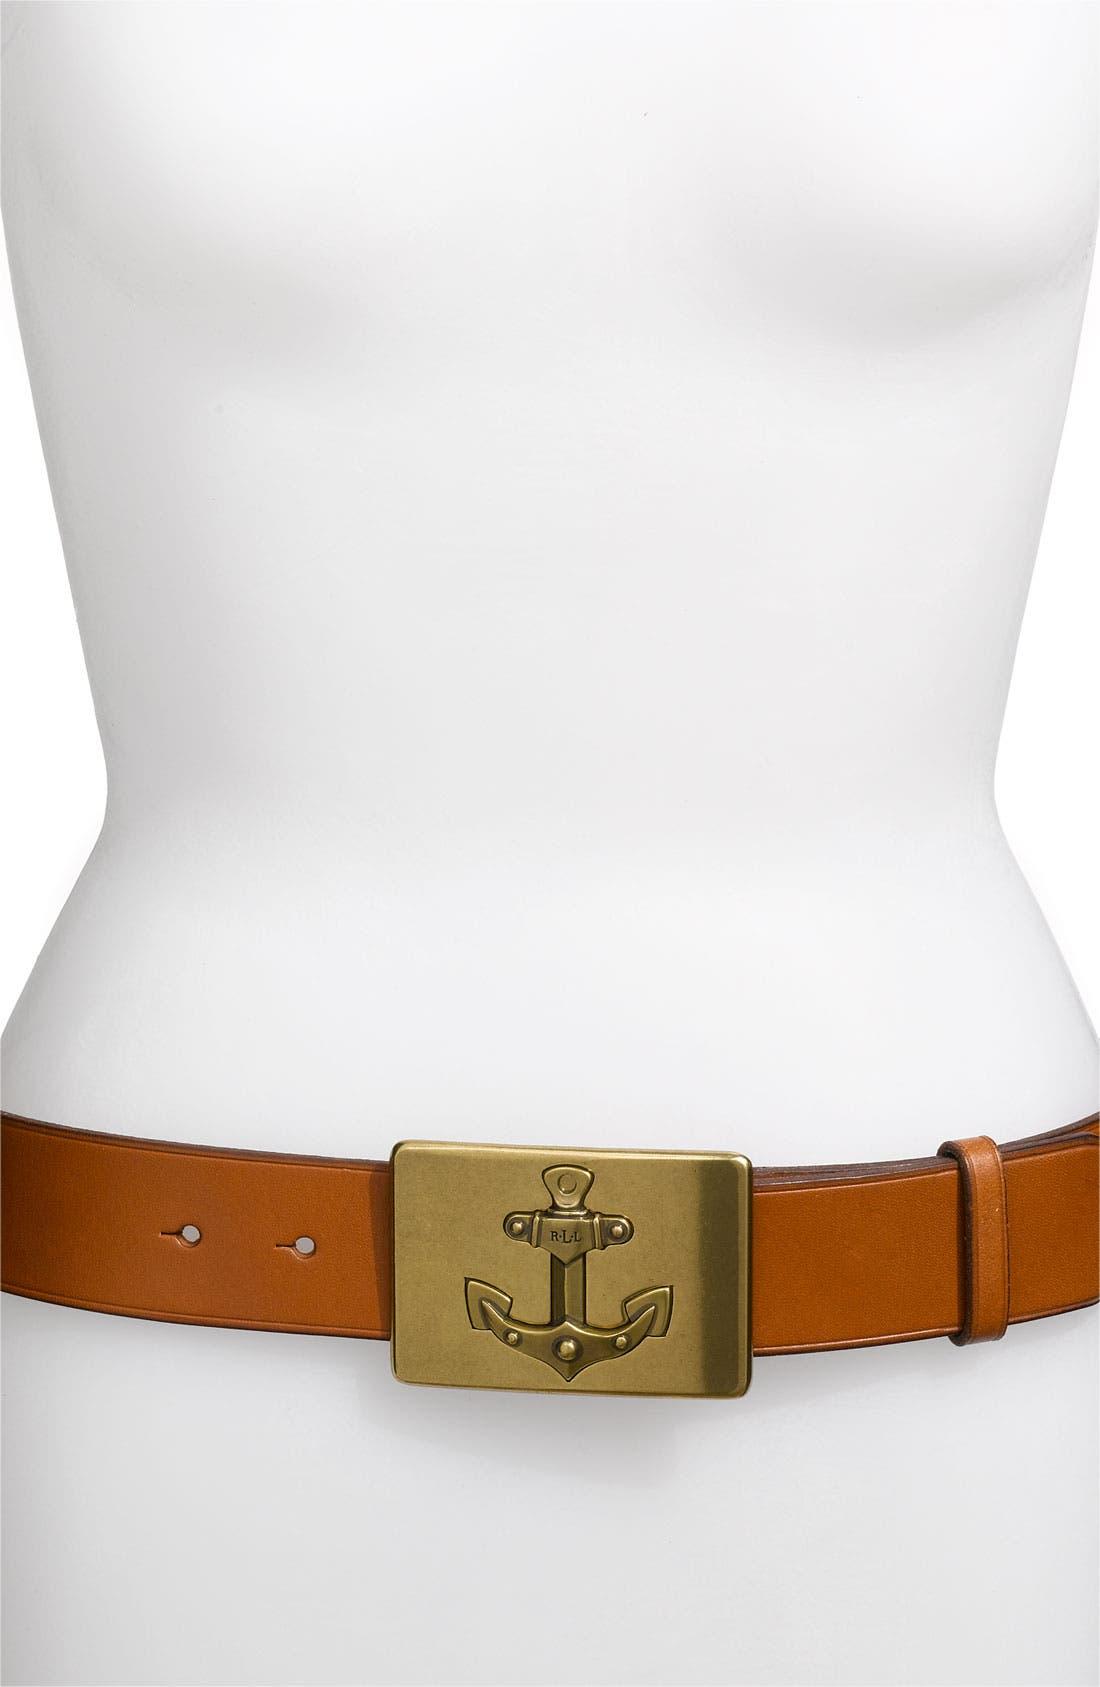 Alternate Image 1 Selected - Lauren by Ralph Anchor Buckle Belt